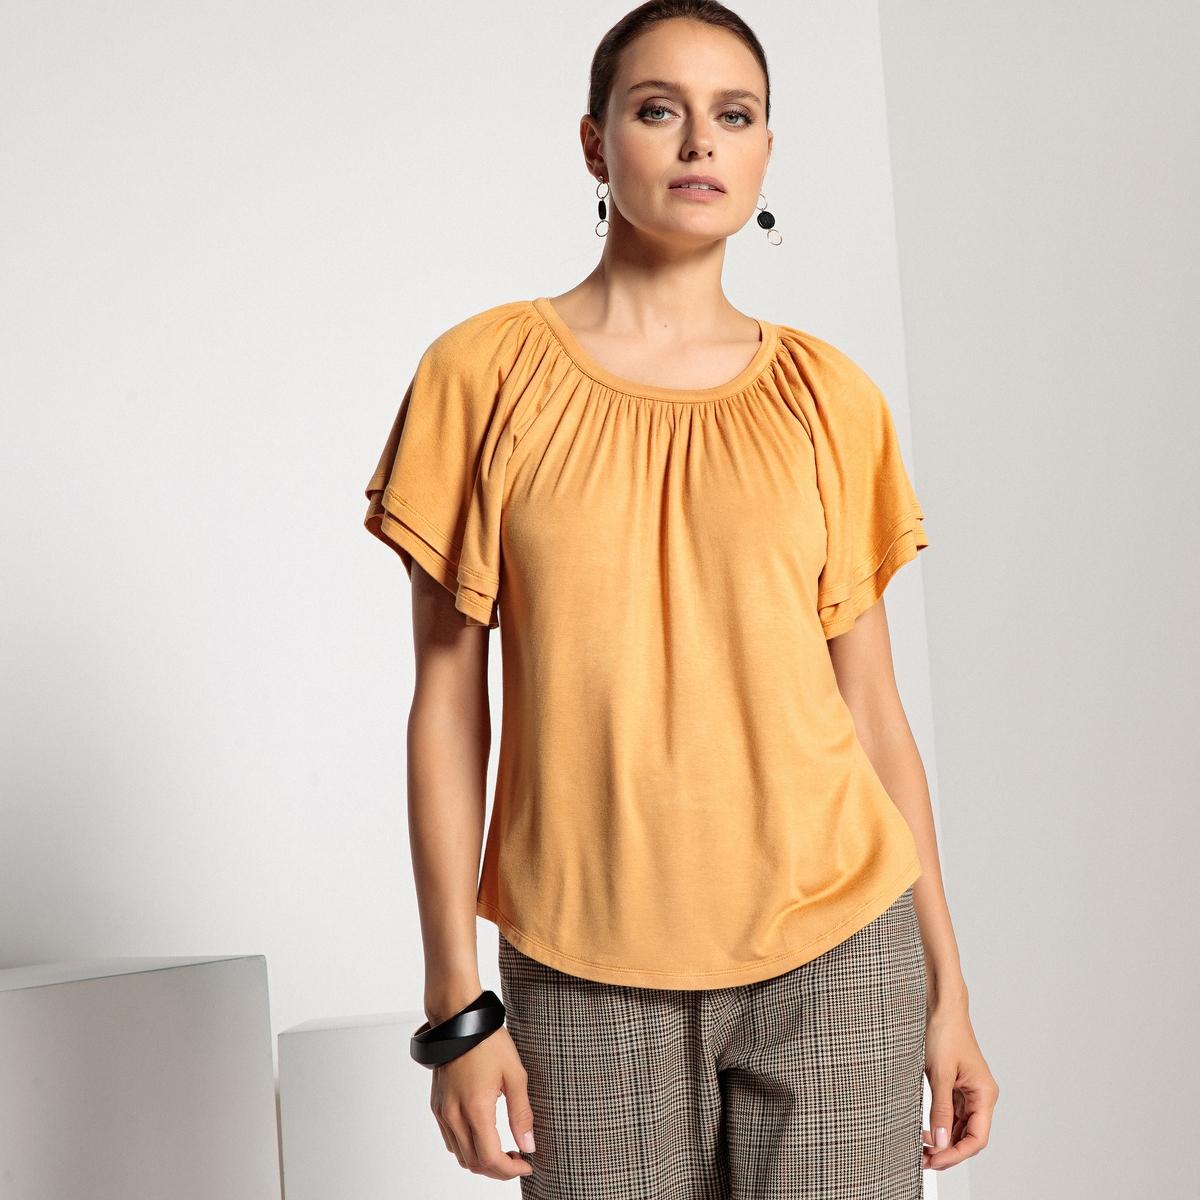 T-shirt com gola redonda, mangas curtas fantasia